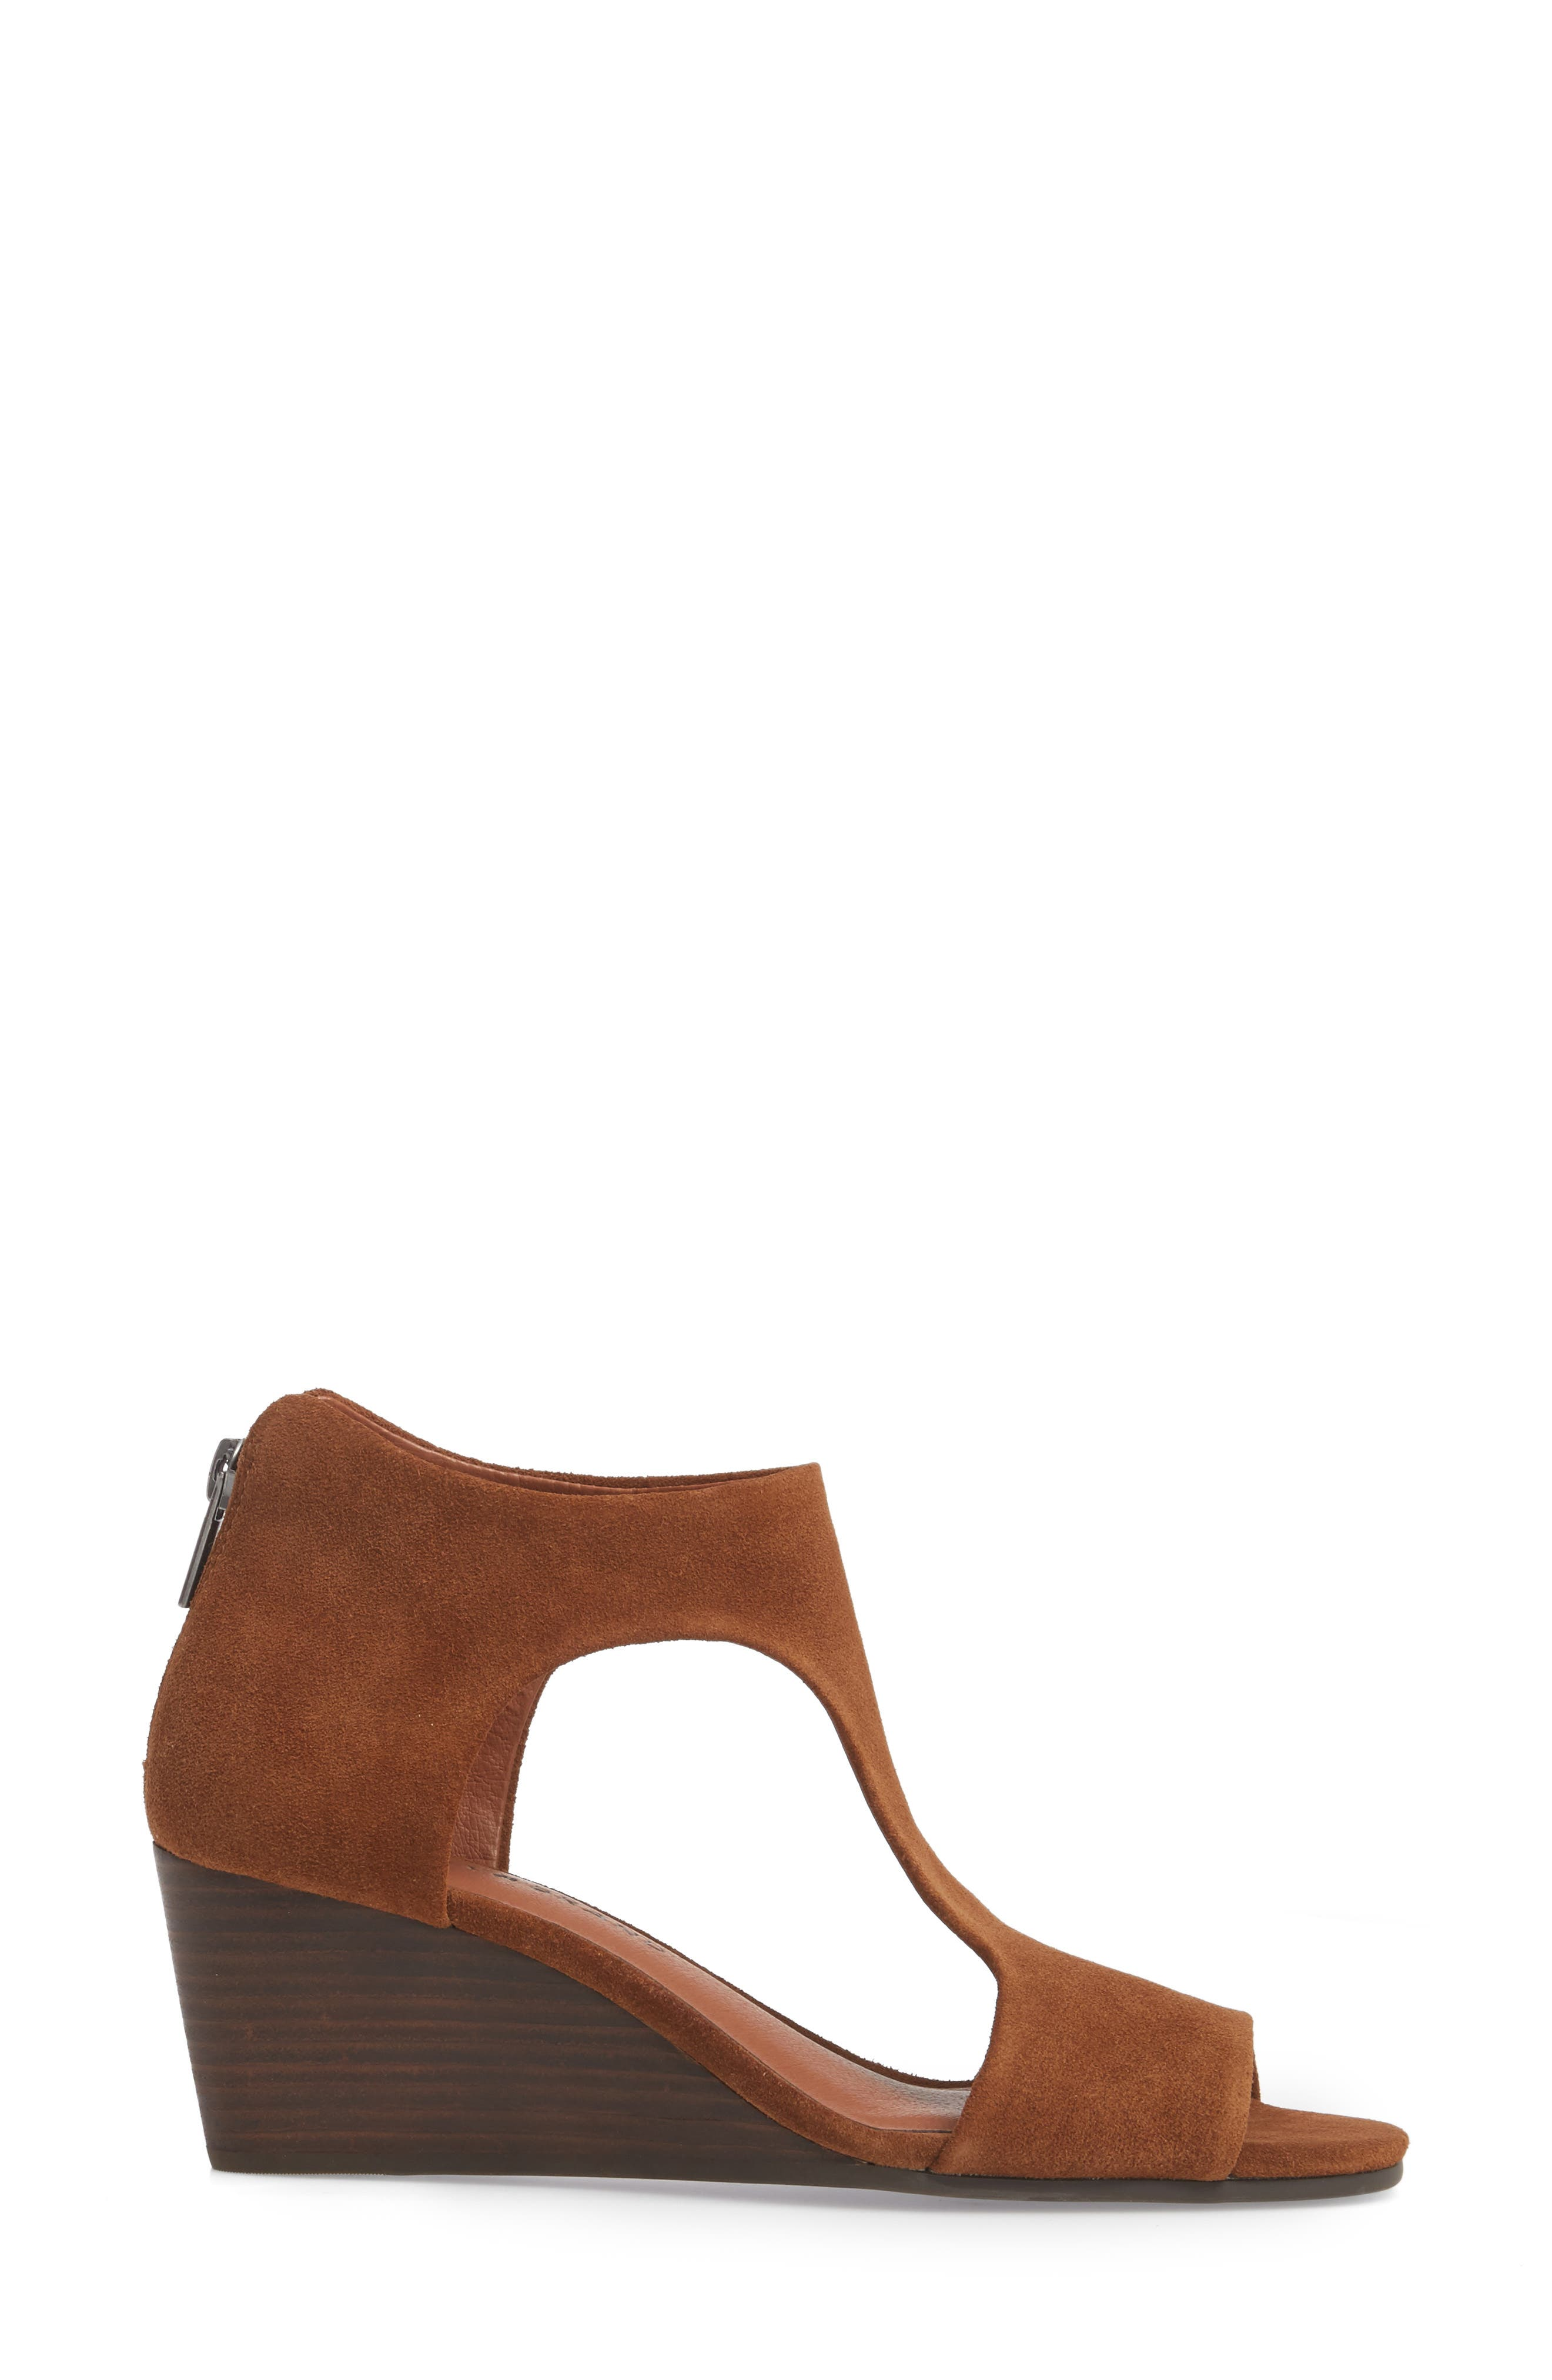 Tehirr Wedge Sandal,                             Alternate thumbnail 3, color,                             Cedar Suede